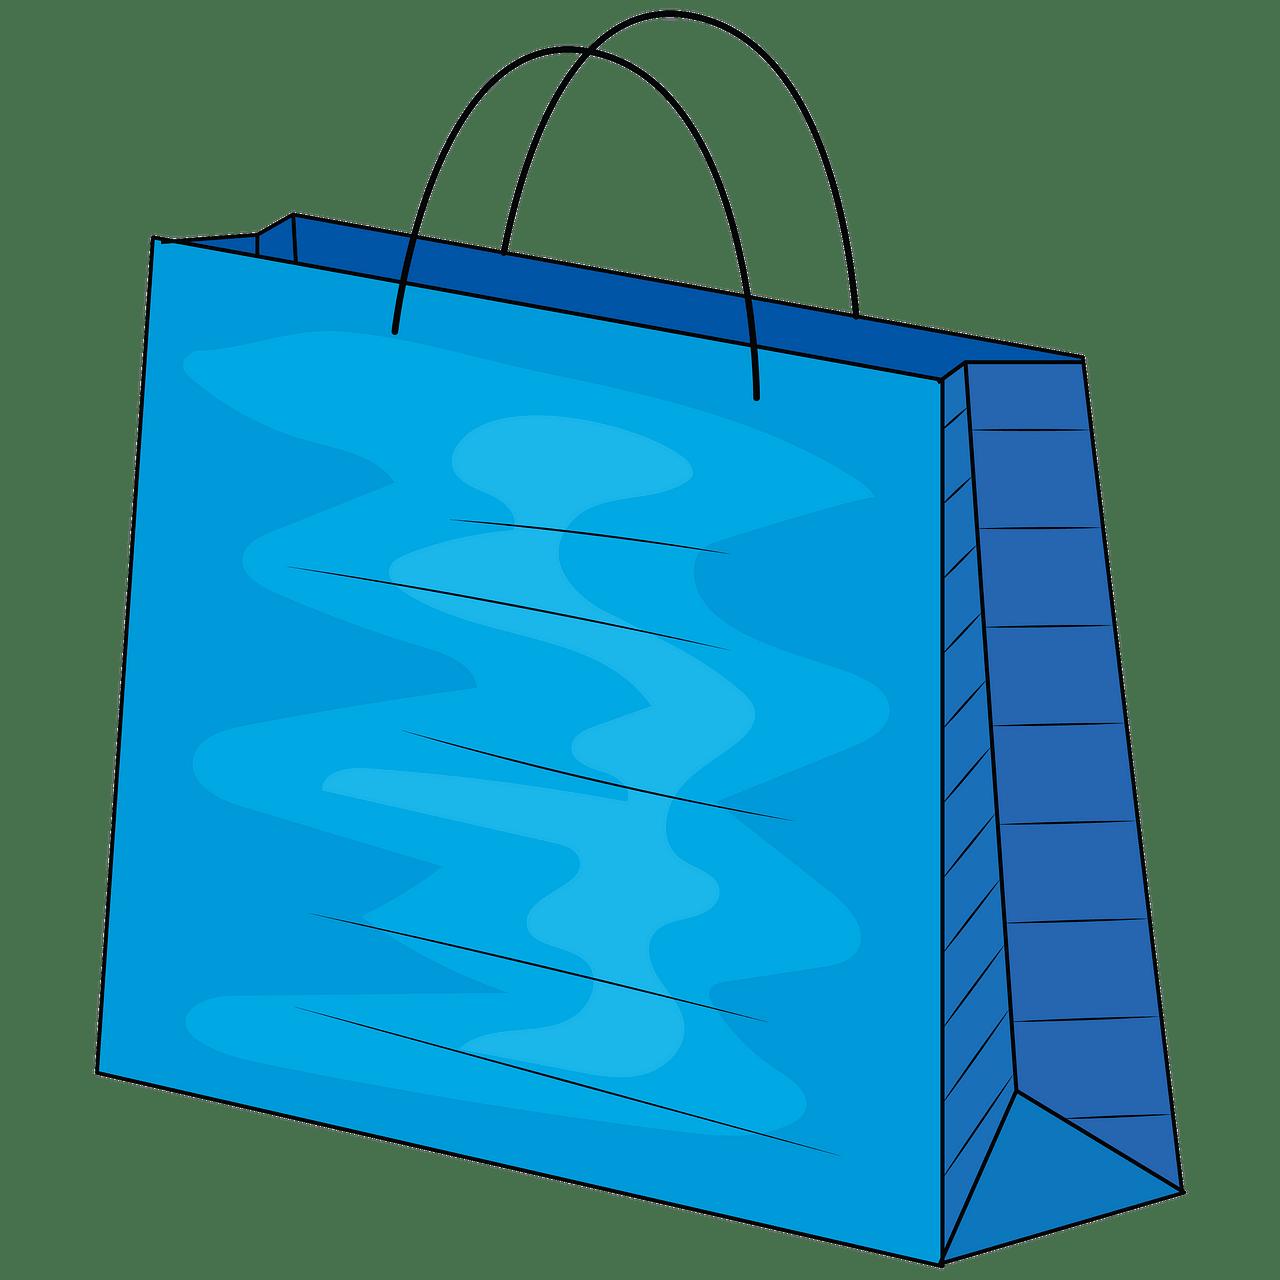 Shopping free download creazilla. Bag clipart blue bag